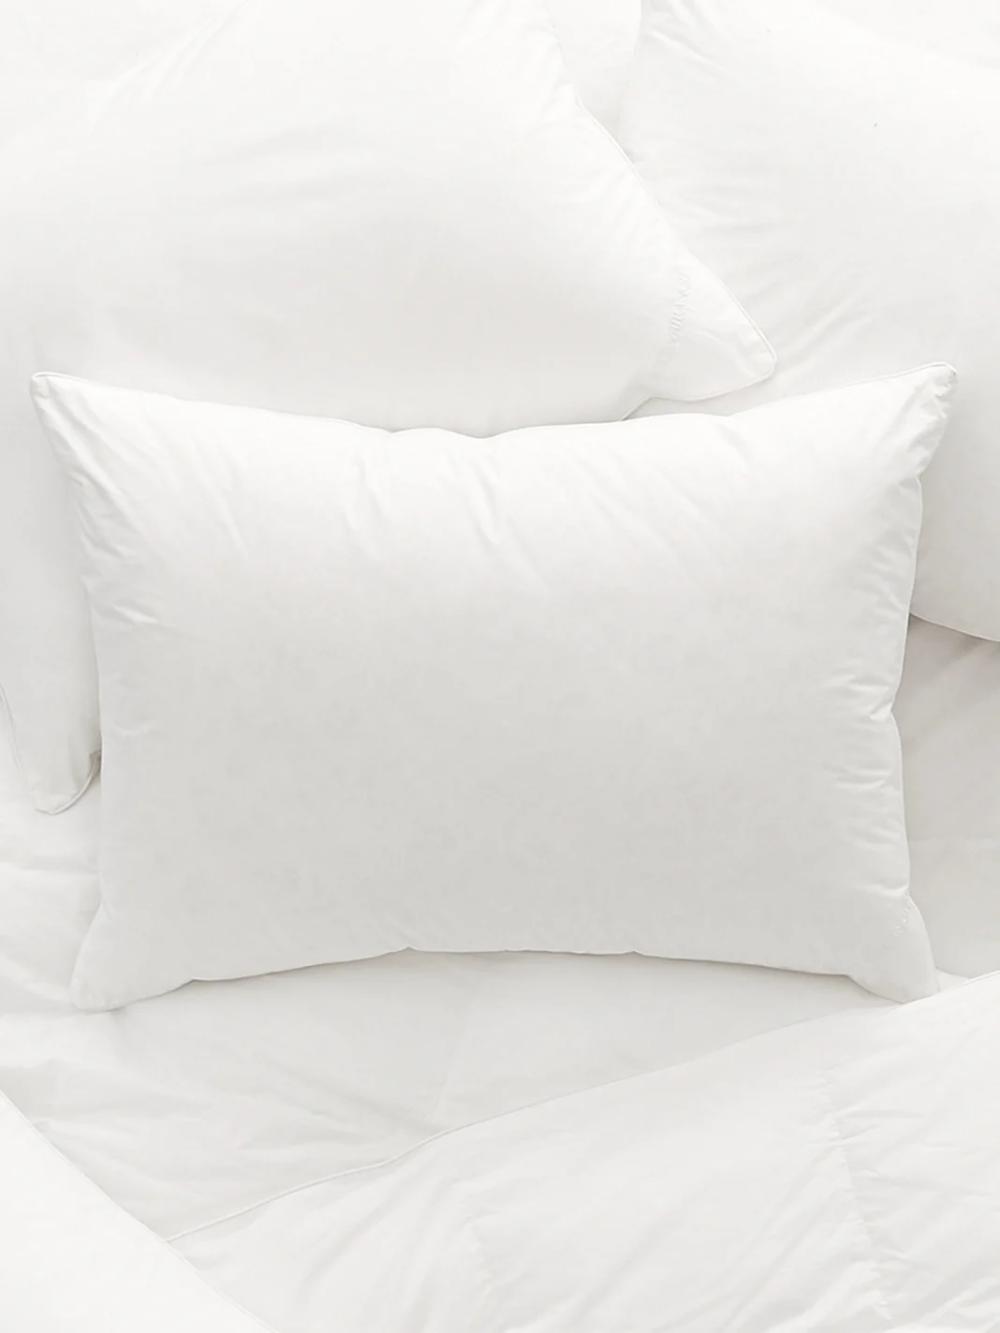 Down Pillow Best Down Pillows Down Pillows Pillows